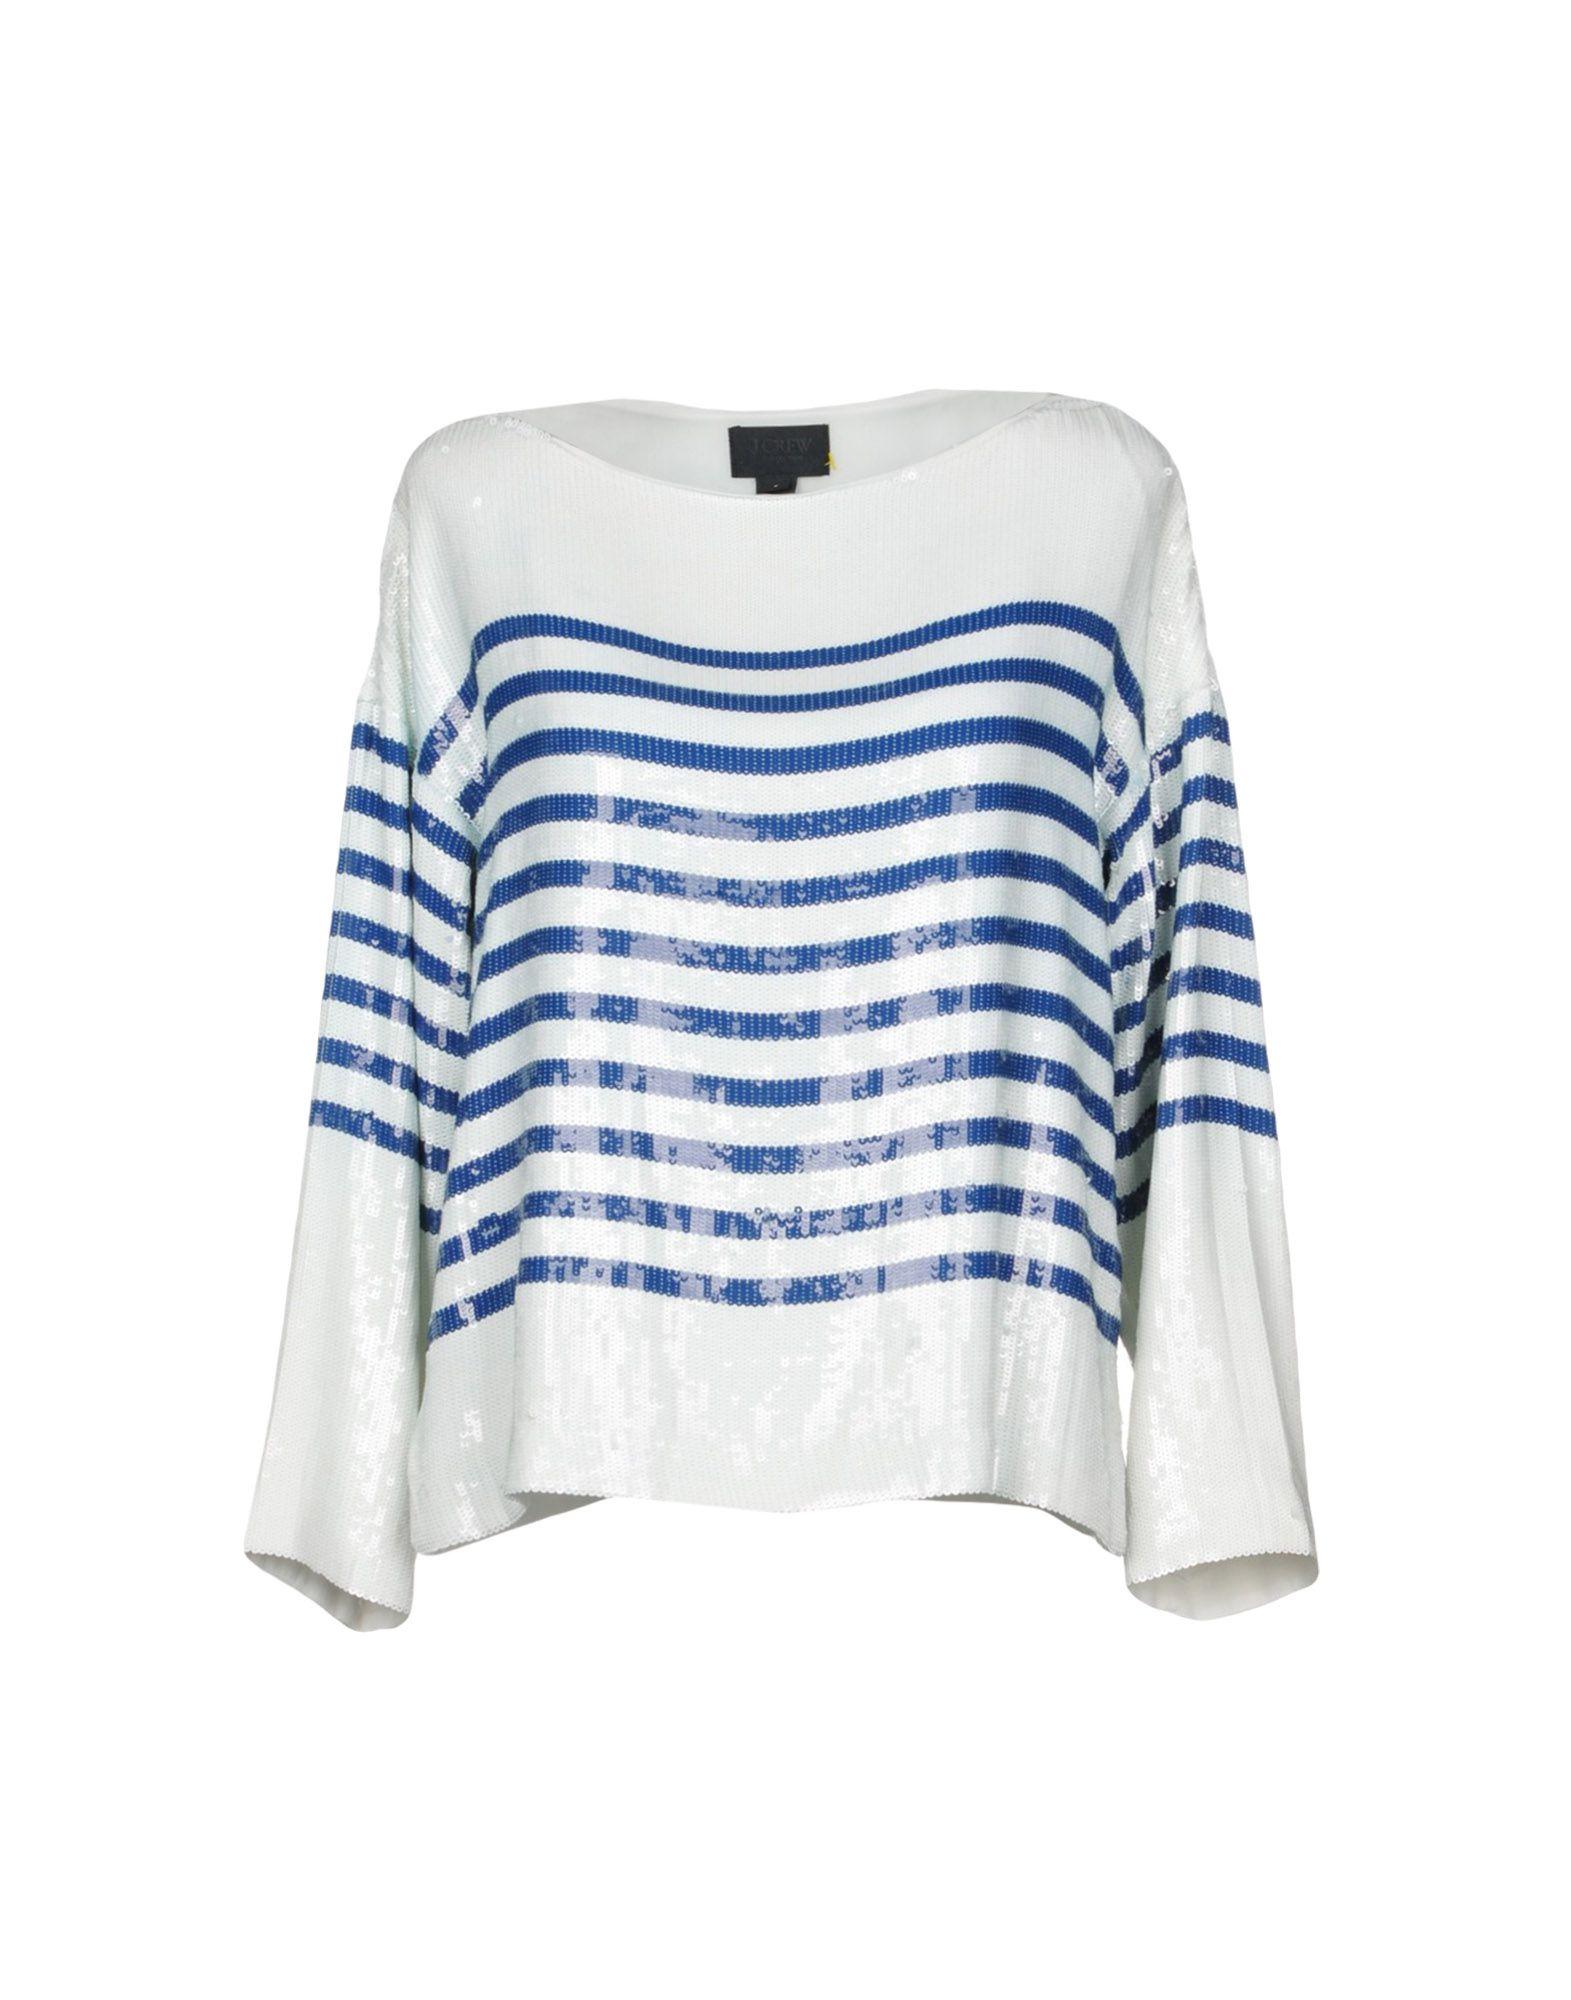 J.CREW Blouses. plain weave, sequined, stripes, long sleeves, turtleneck, no pockets. 100% Silk